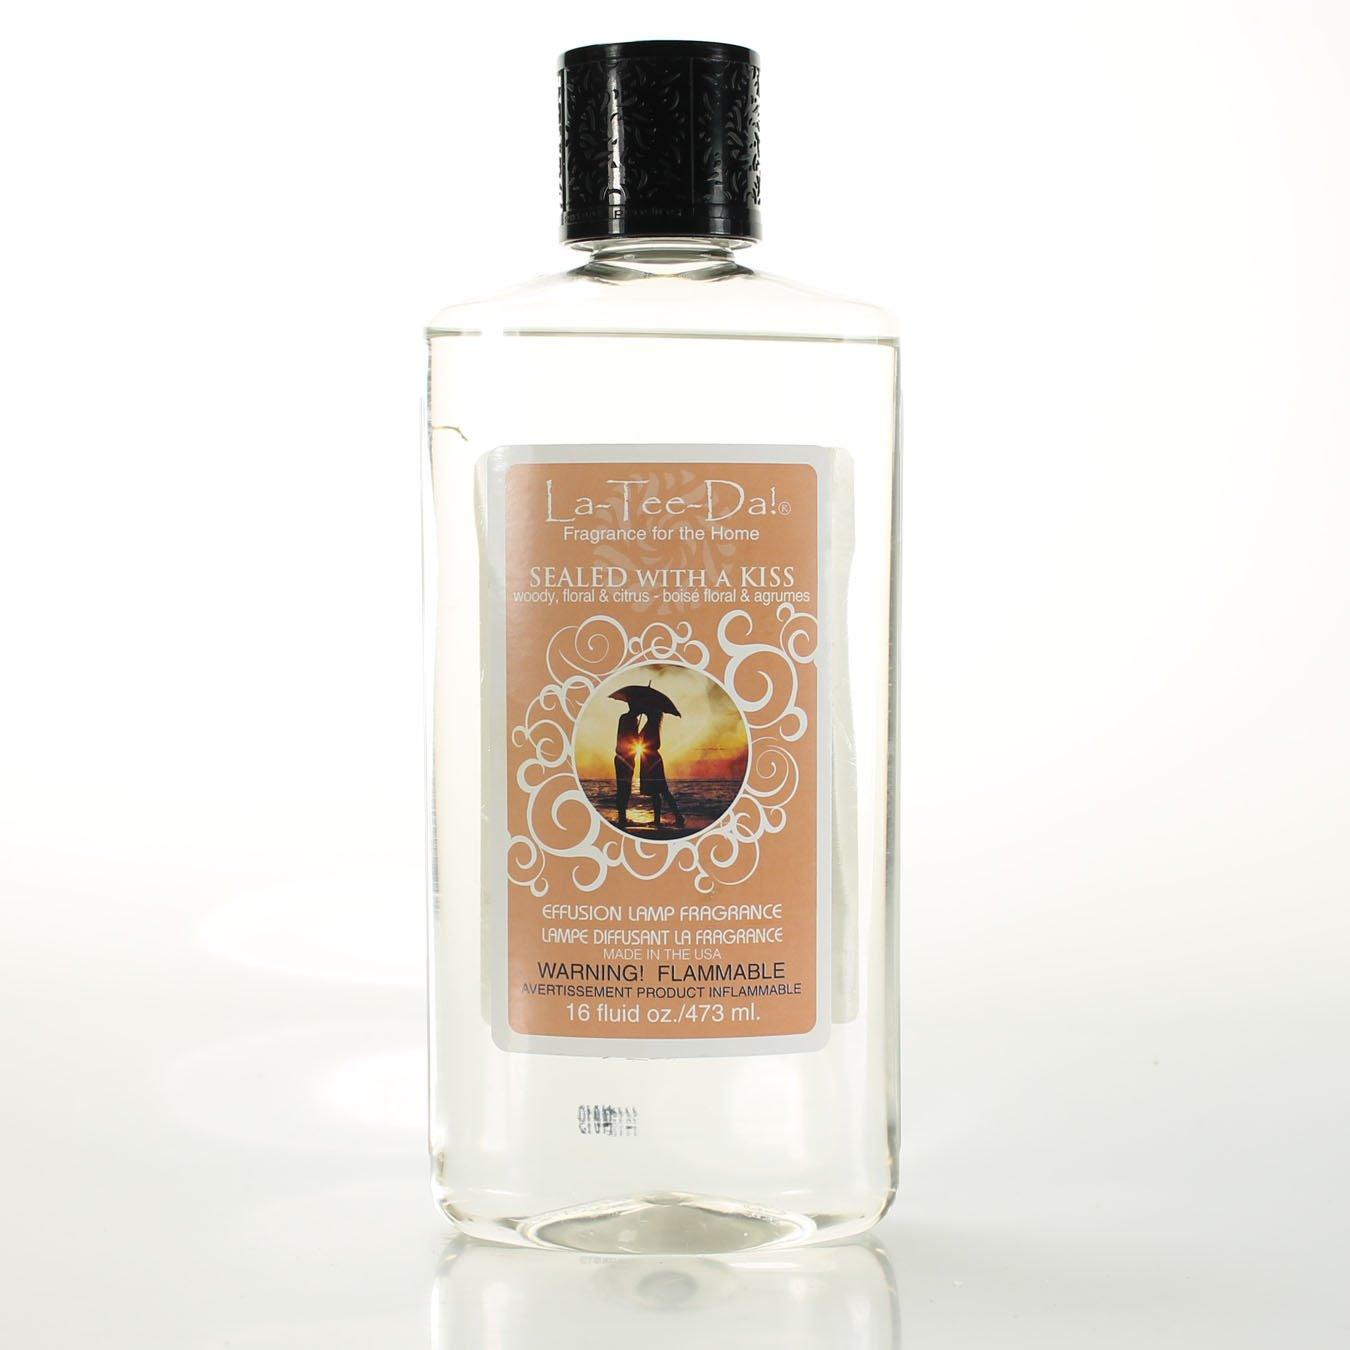 La Tee Da Fuel Fragrance Sealed With A Kiss (16 oz)